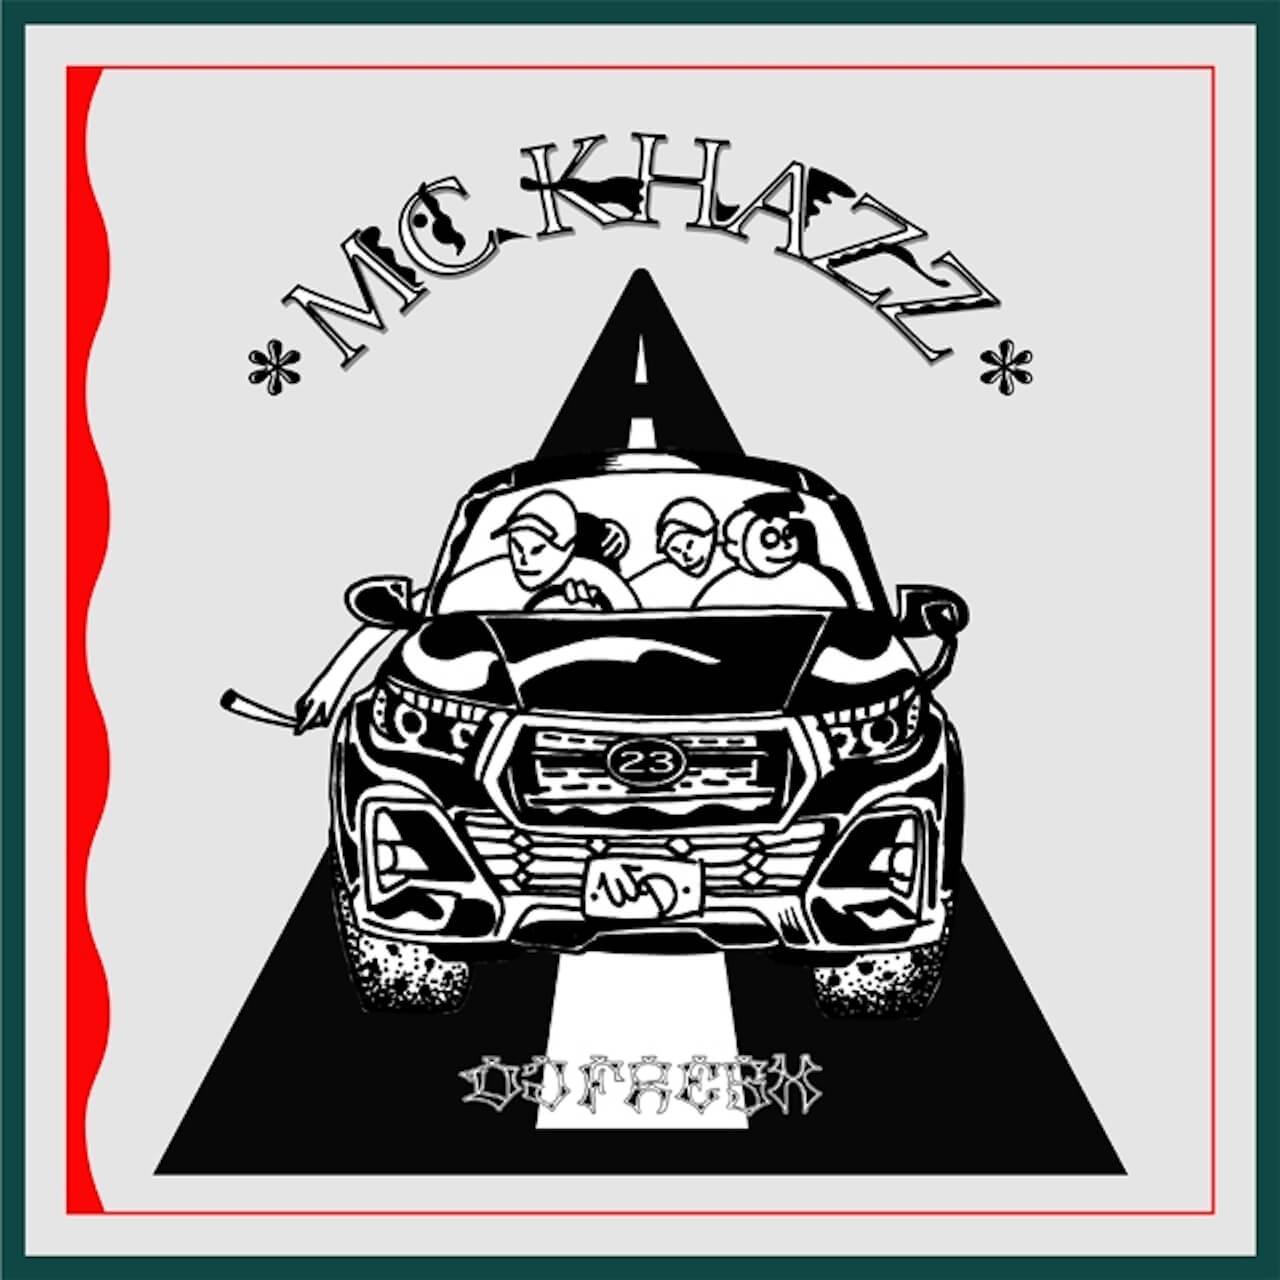 〈WDsounds〉の新プロジェクトから、MC KHAZZによるシングル「23Breeze/R1」がリリース music200925-mckhazz-1